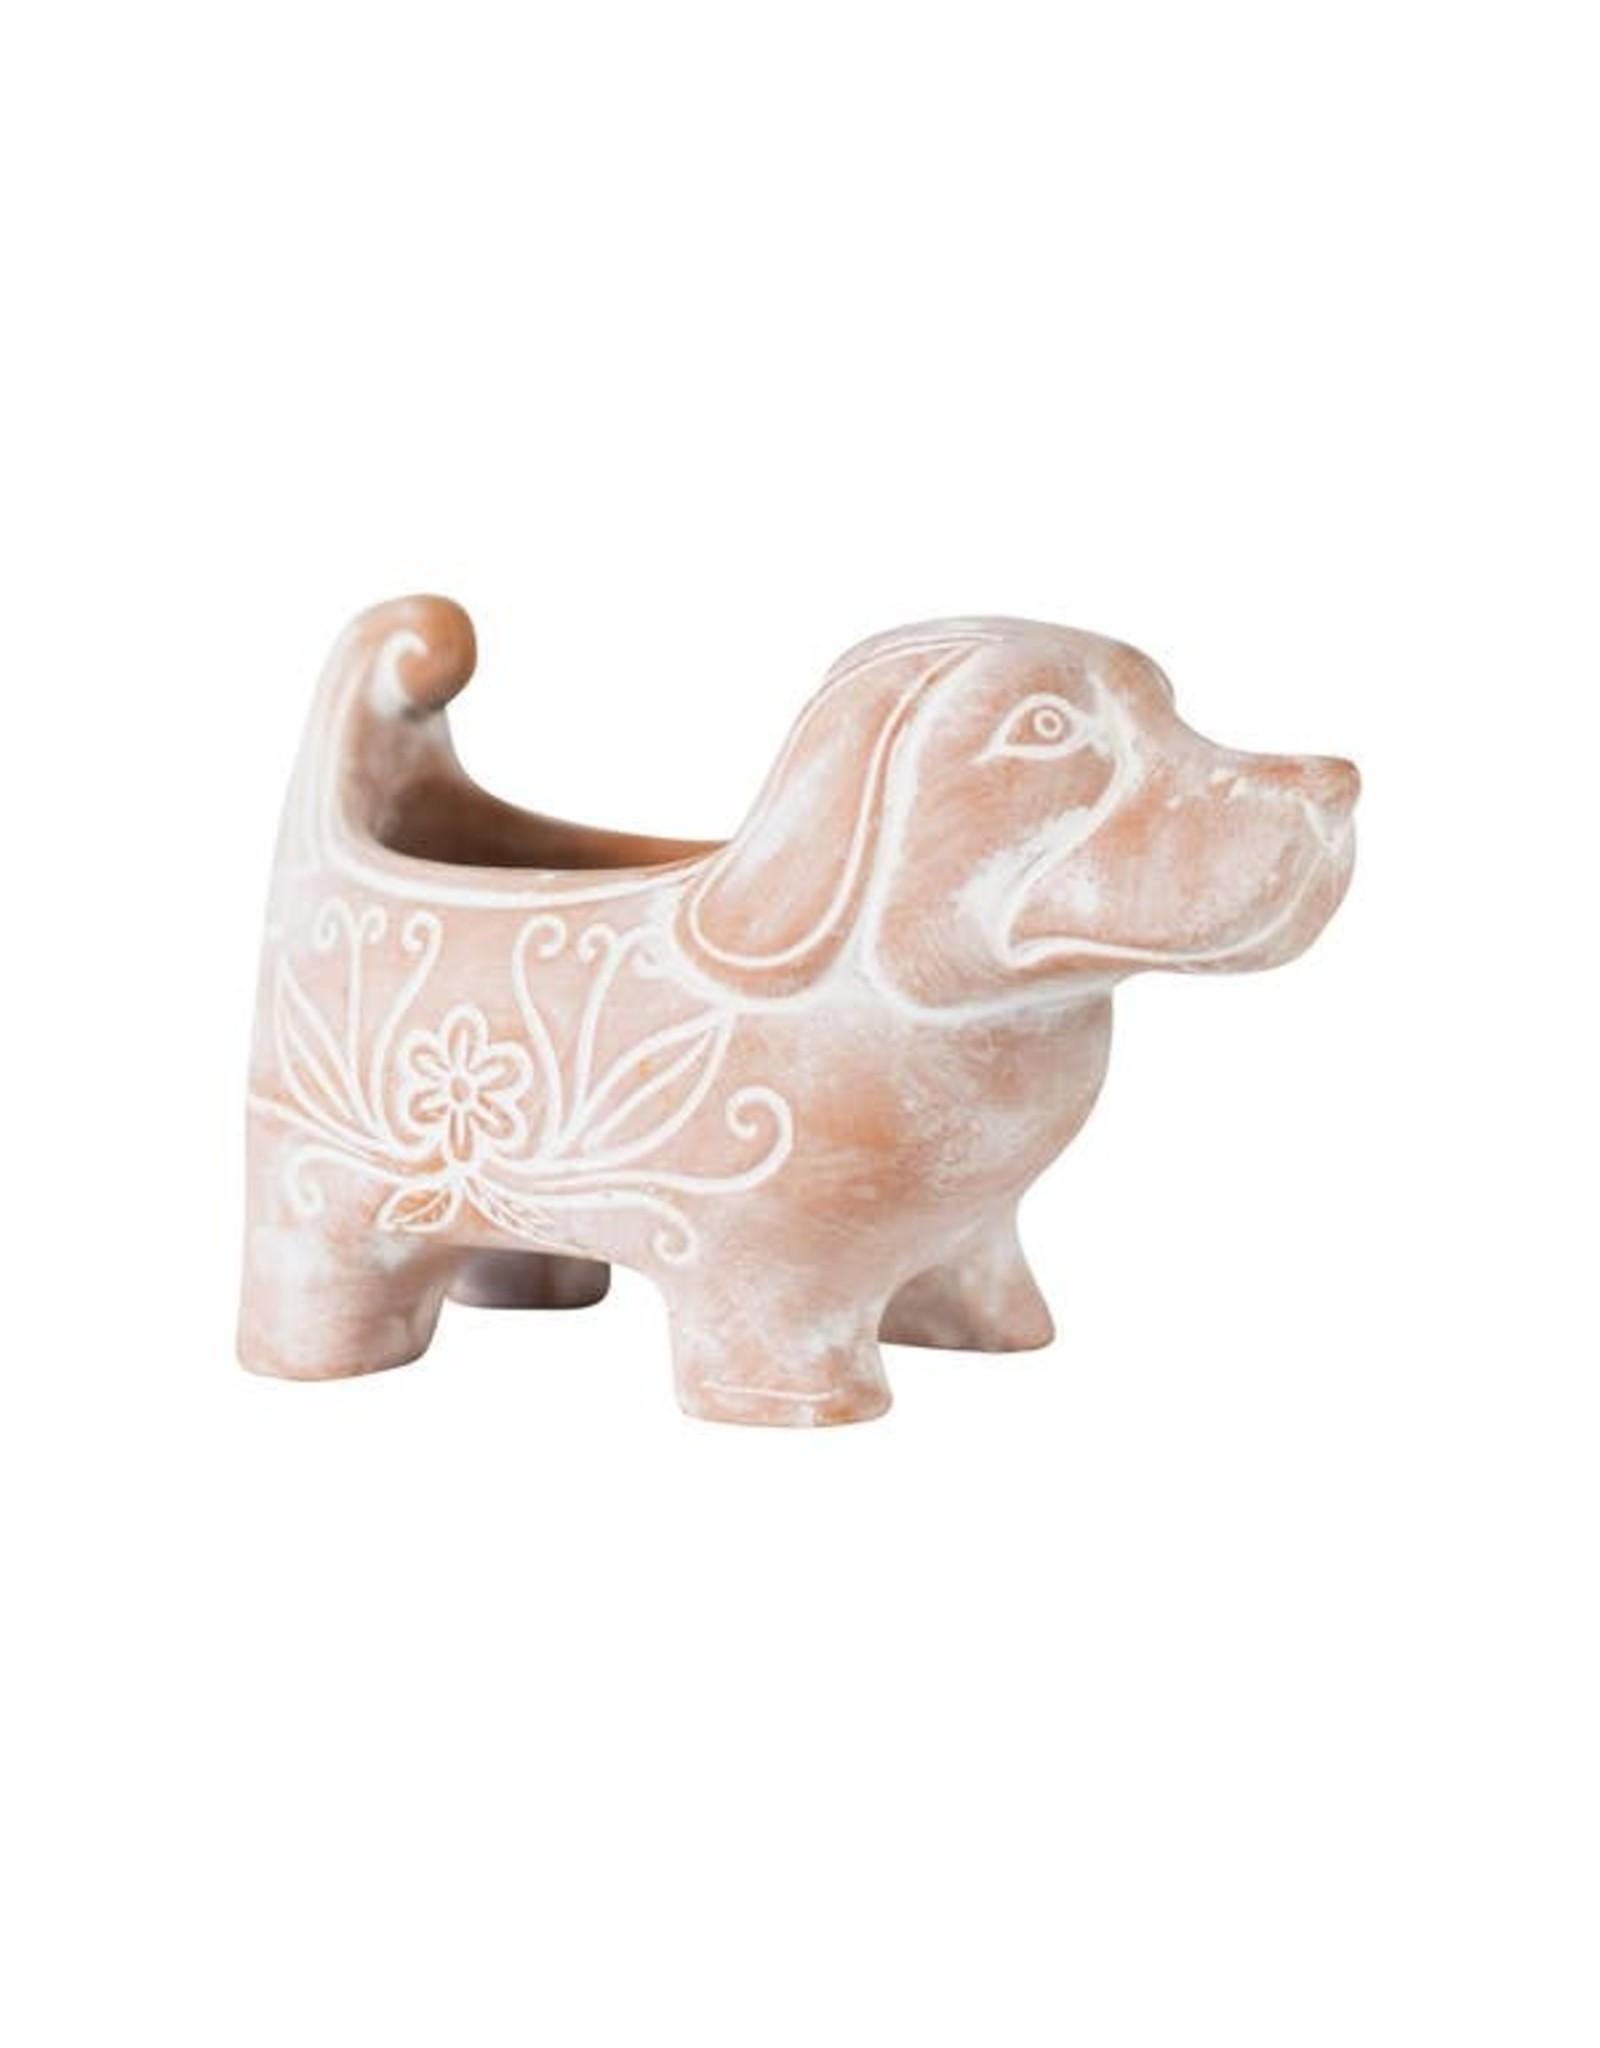 Terracotta Dog Planter, Large, Bangladesh